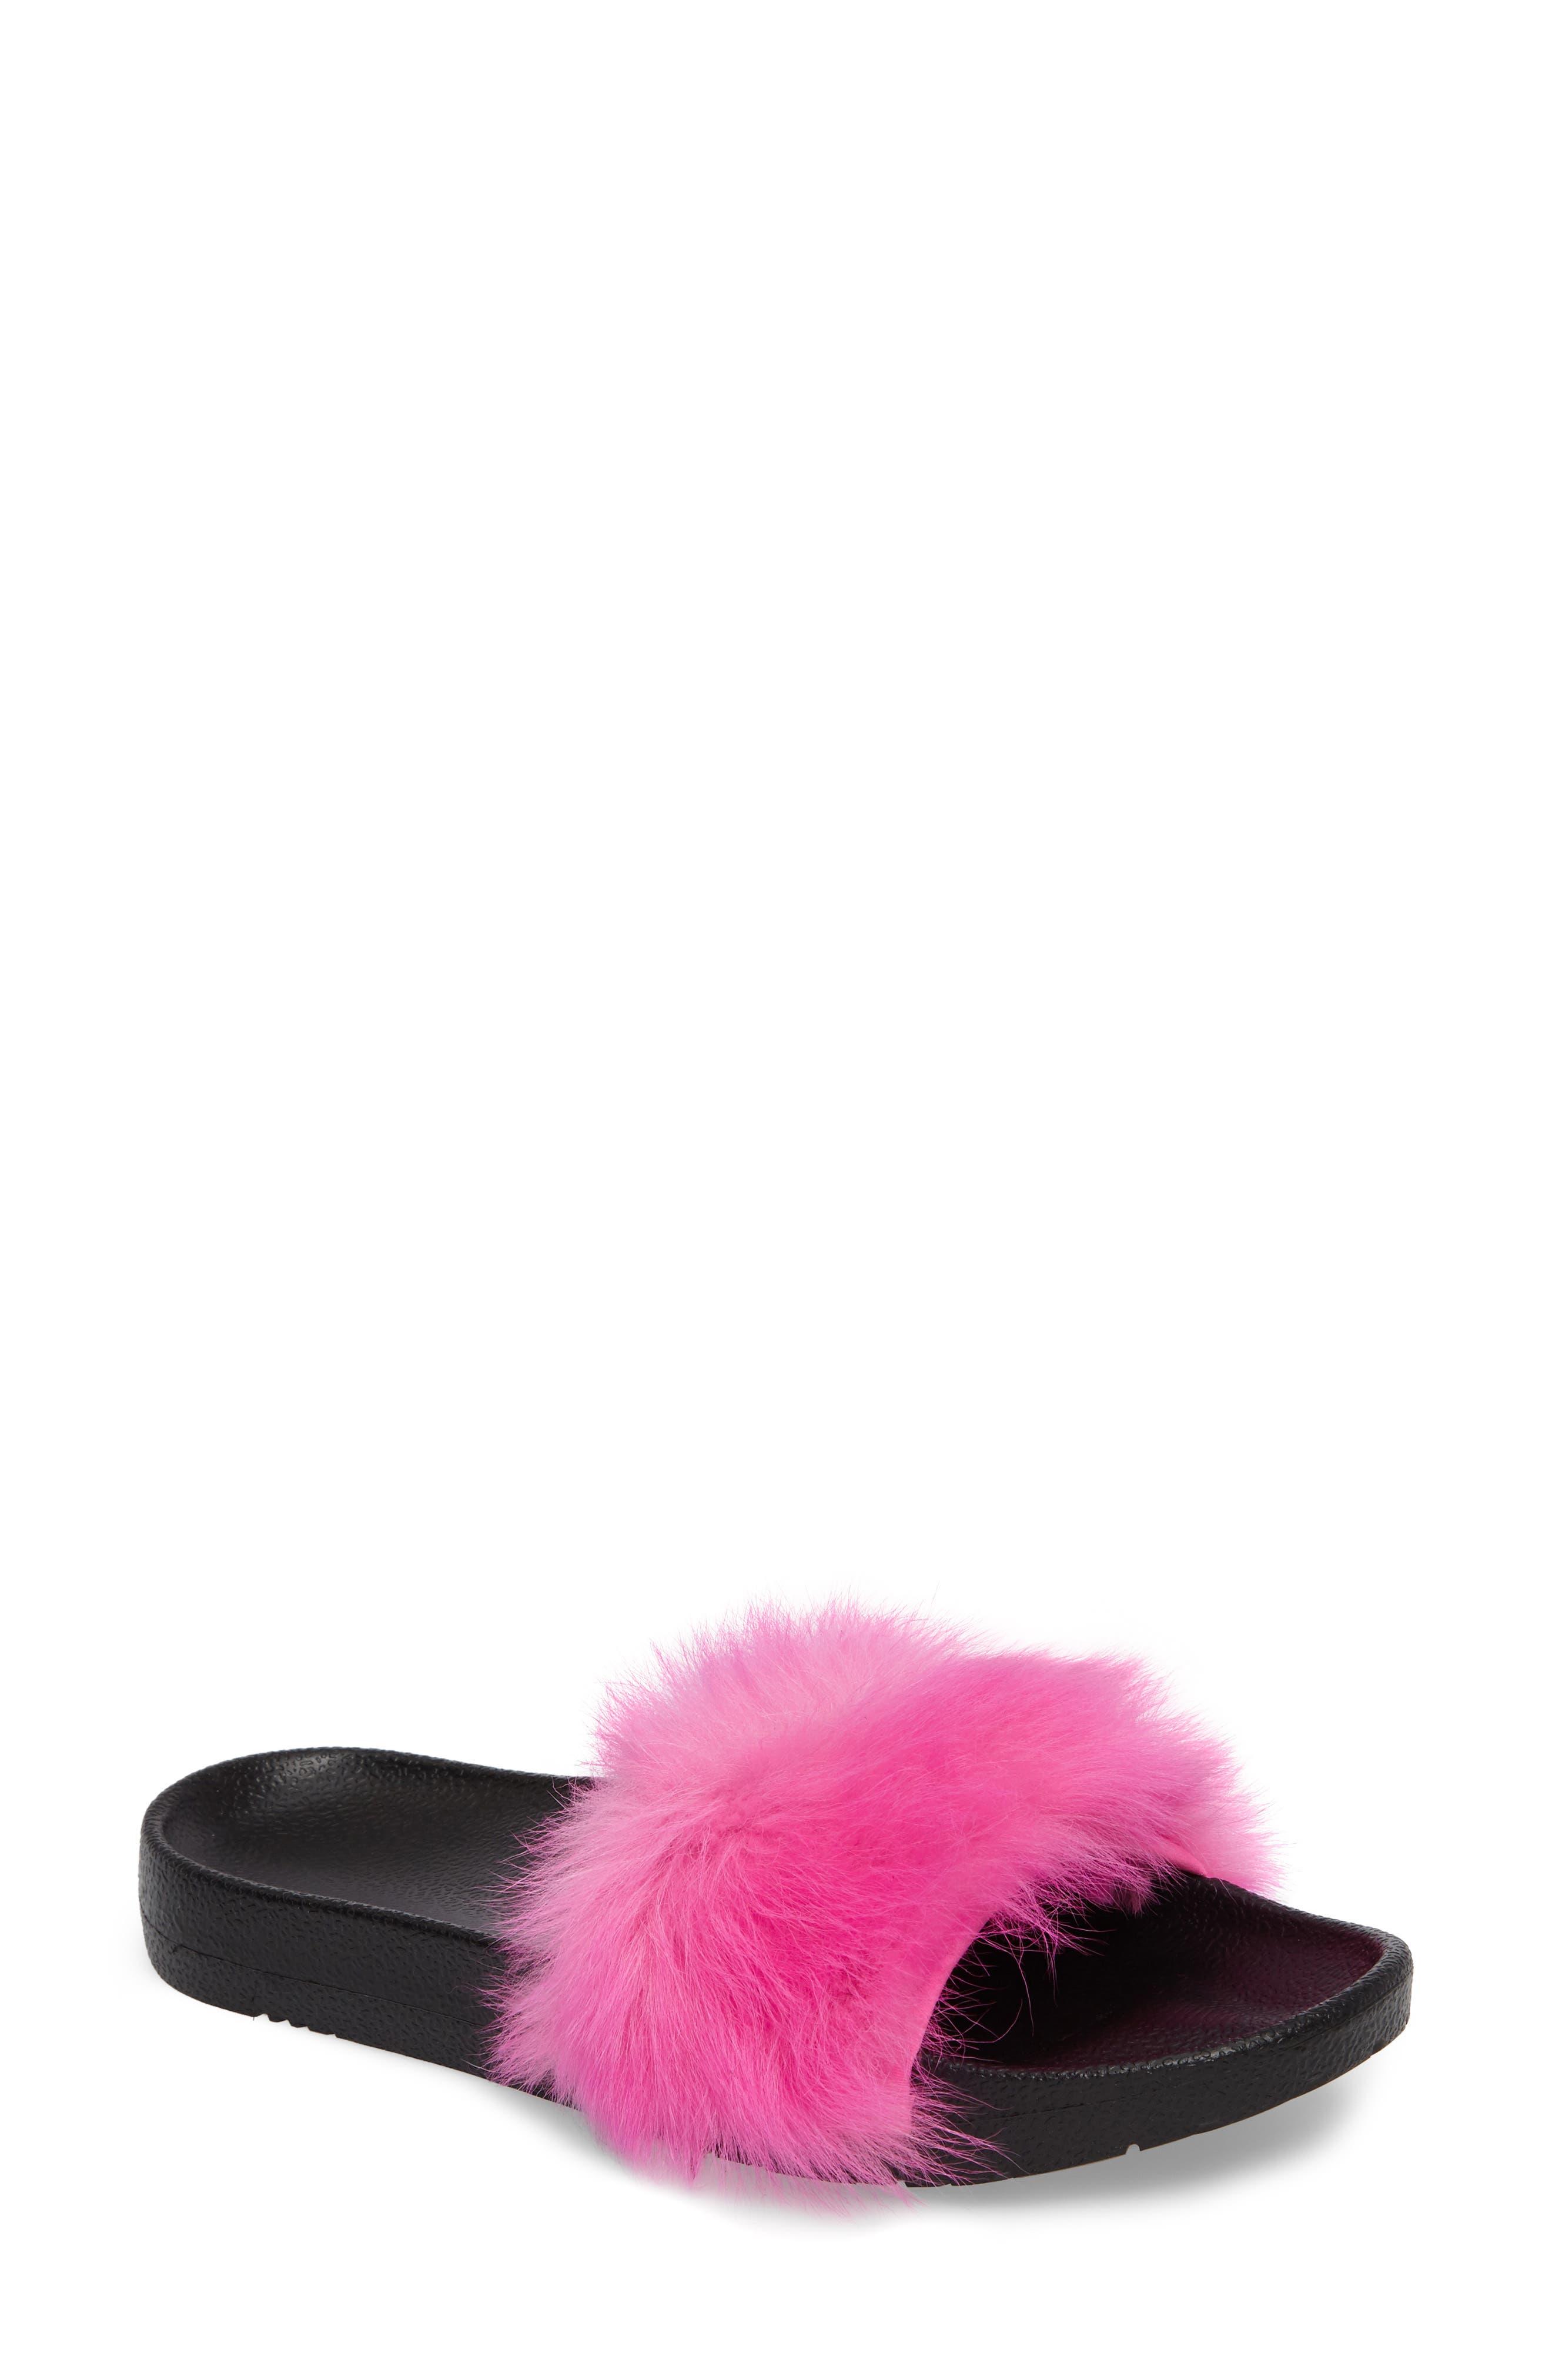 Royale Genuine Shearling Slide Sandal,                             Main thumbnail 1, color,                             Neon Pink